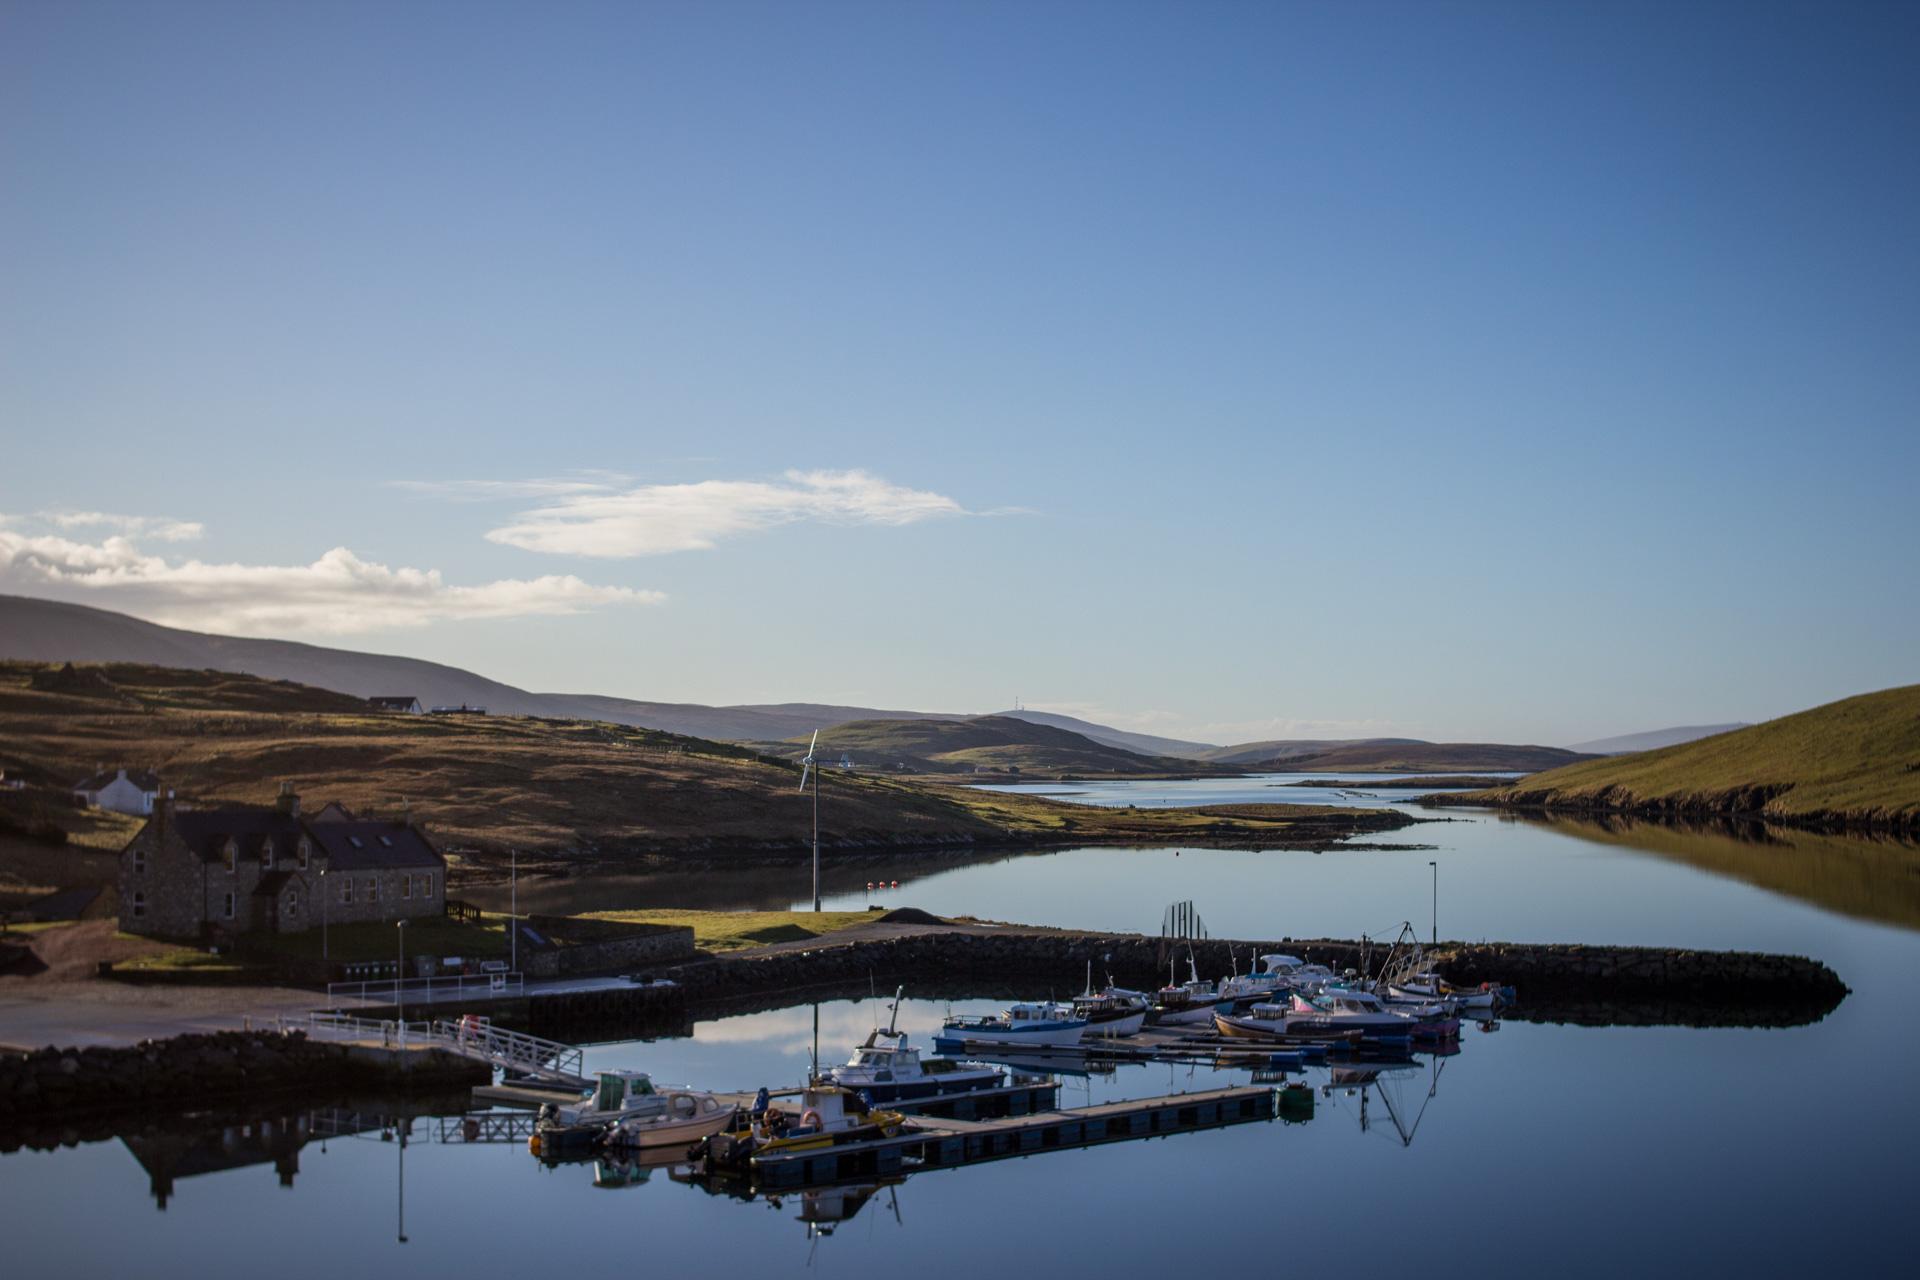 Caravan site Shetland